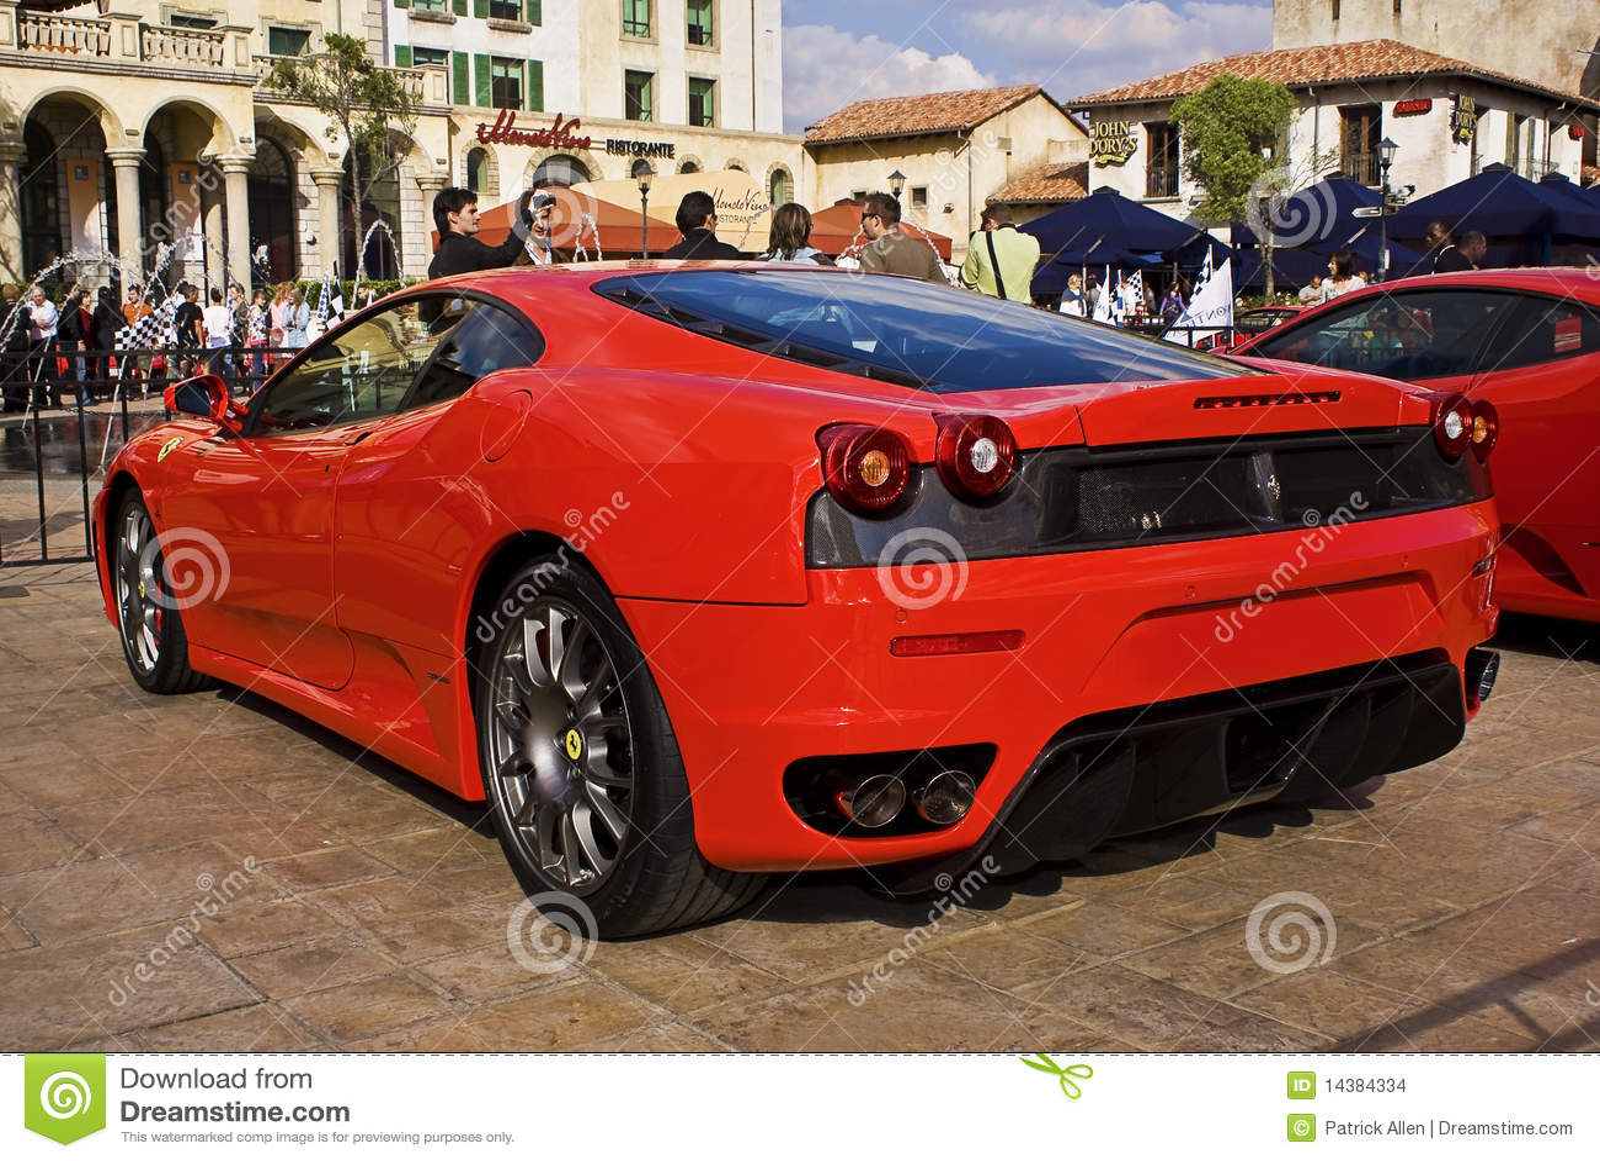 Ferrari Show Day F430 Coupe Rear End Editorial Stock Image Image Of Modena Montecasino 14384334